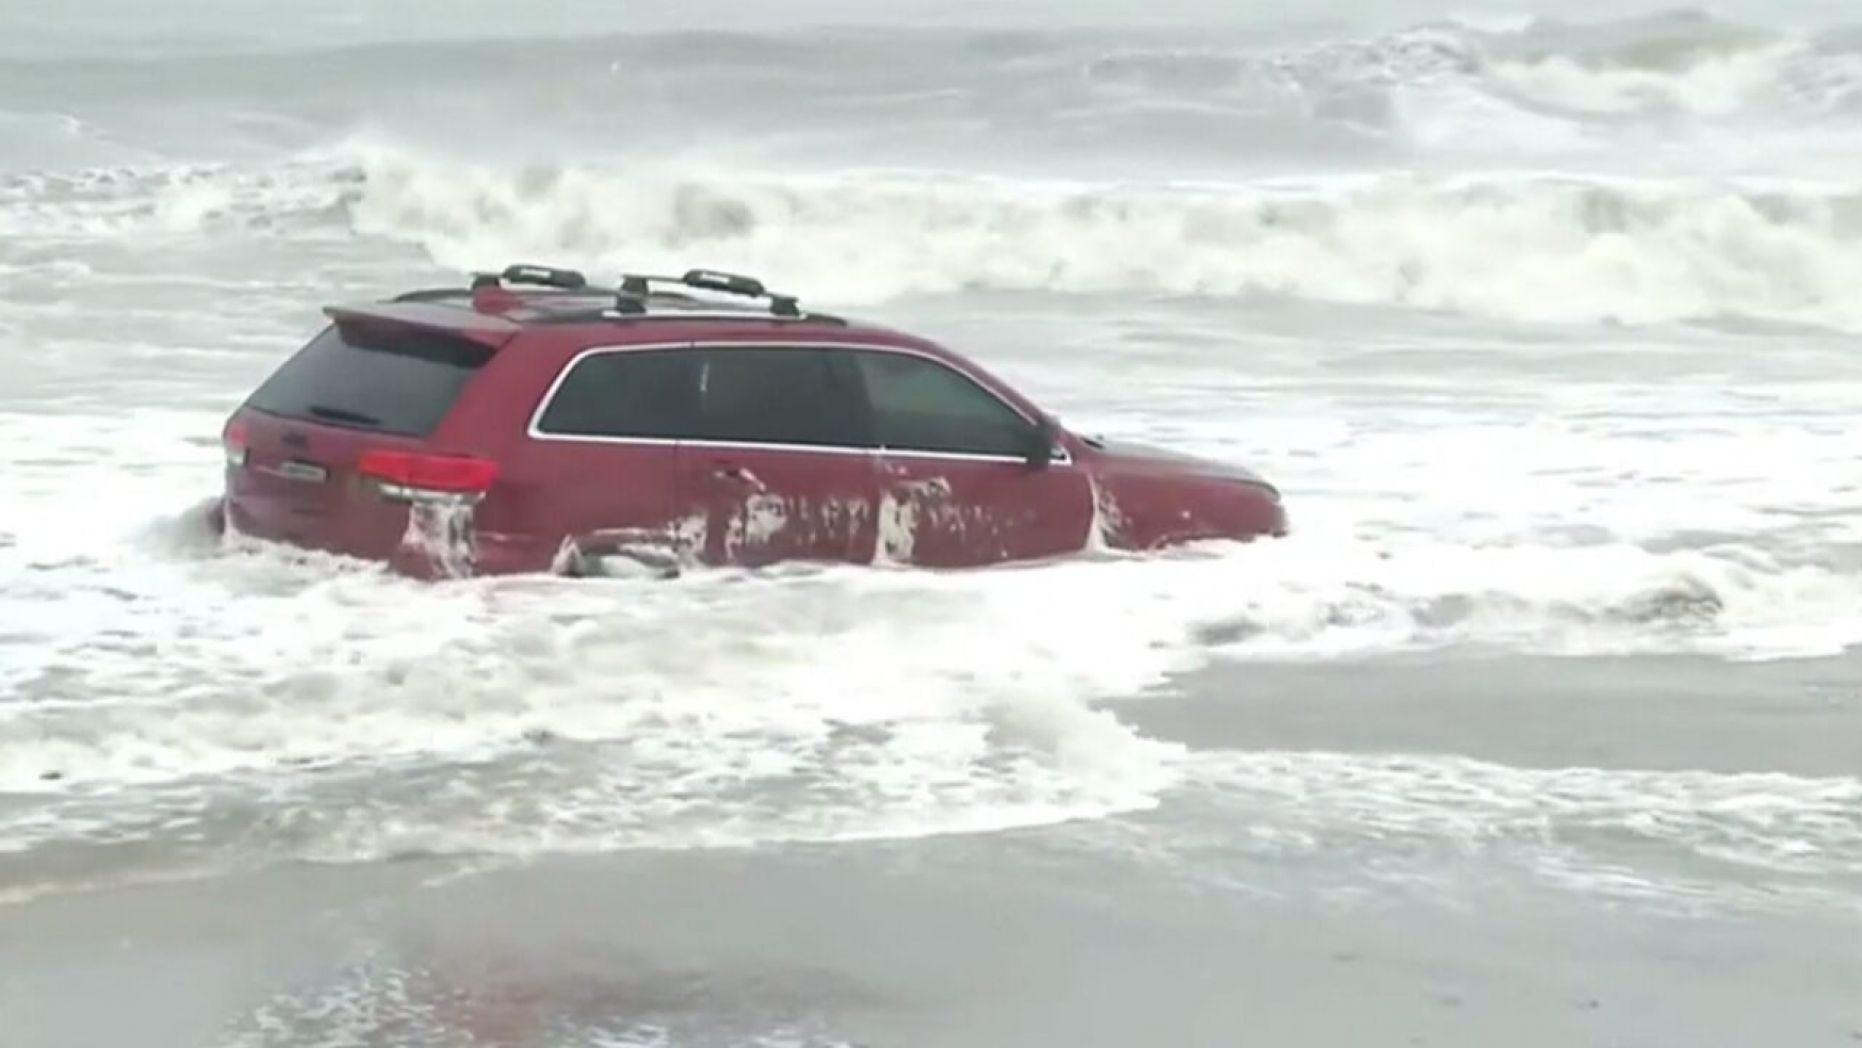 Jeep owner explains why vehicle was left on South Carolina